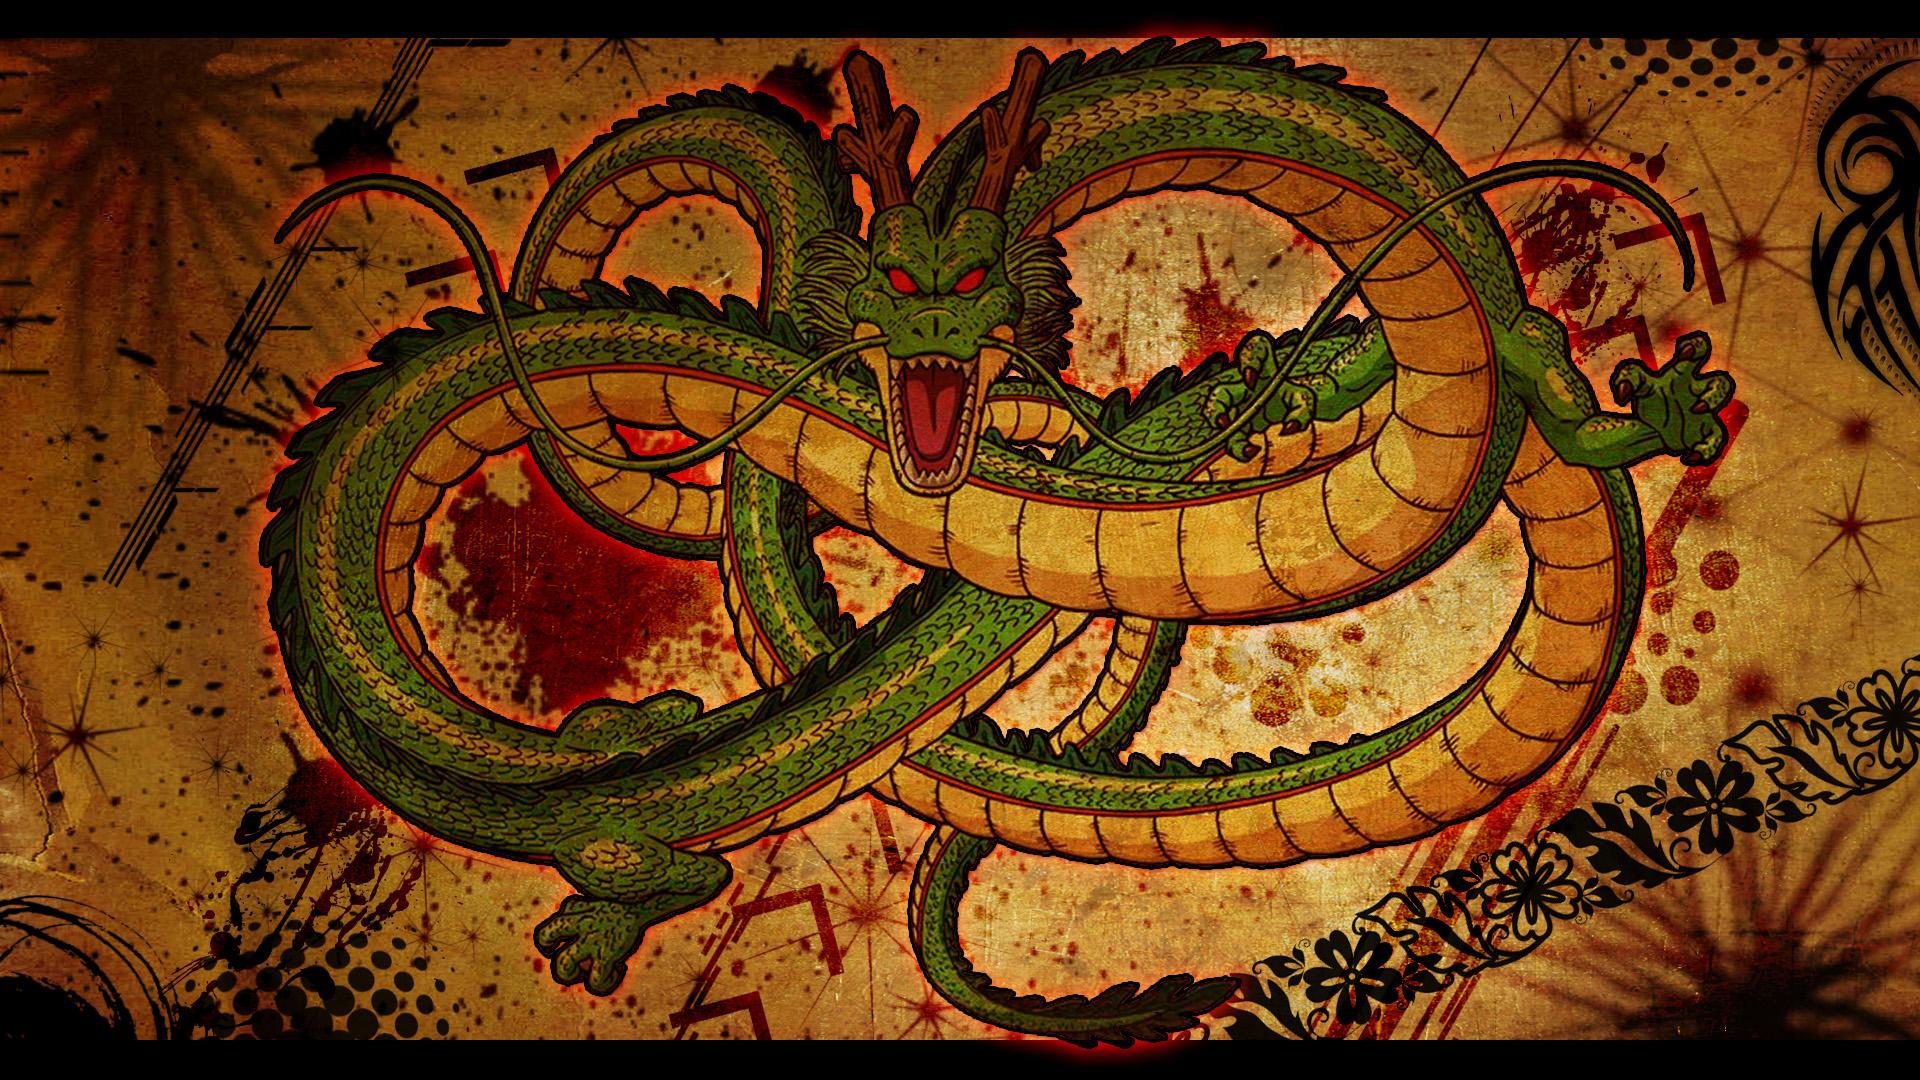 dragon ball desktop wallpaper download dragon ball wallpaper in hd 1920x1080